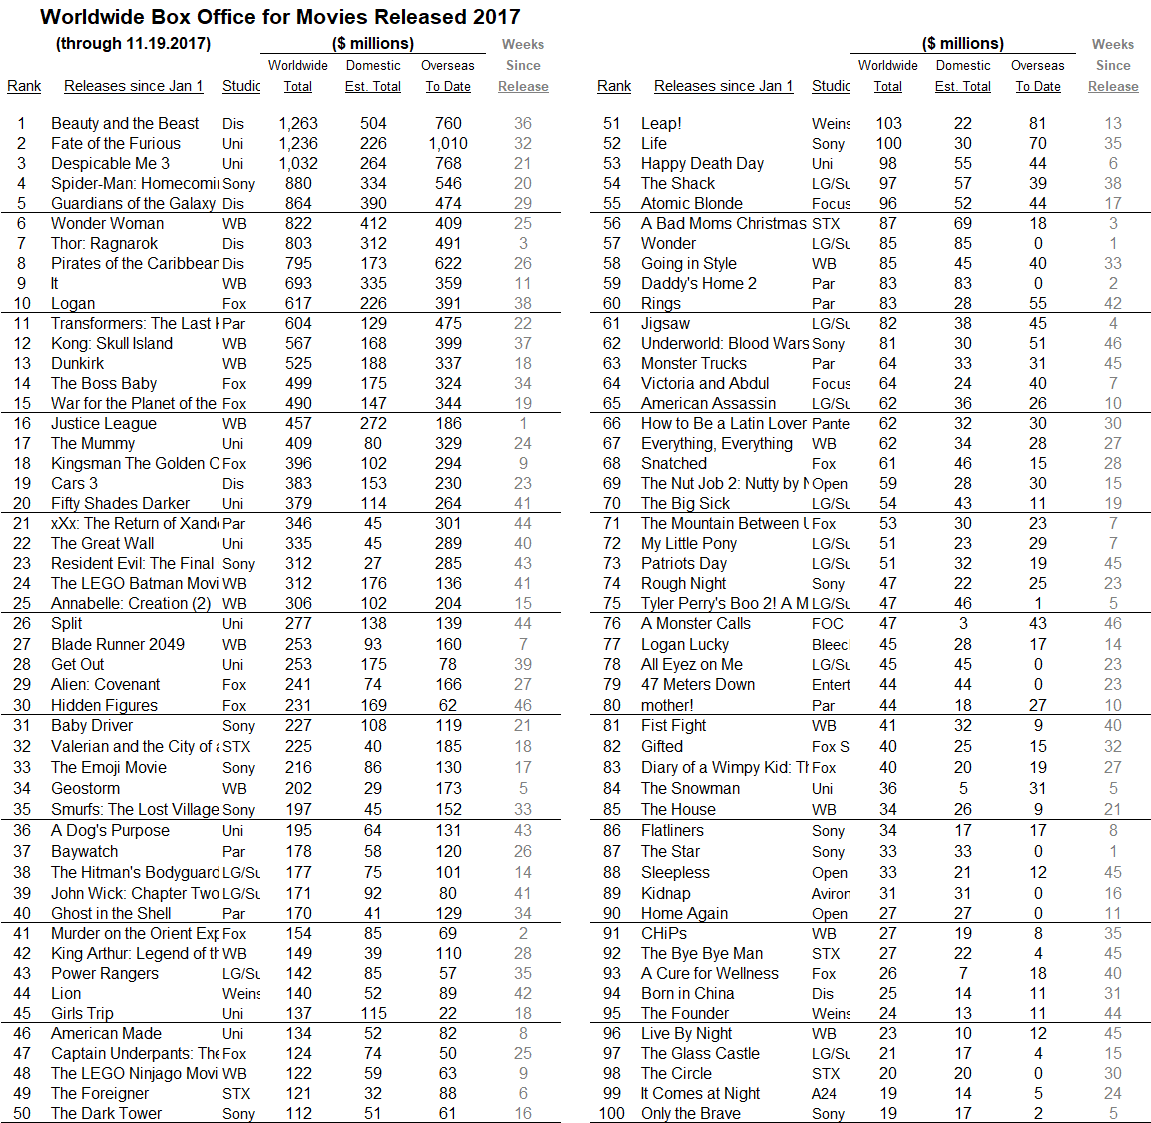 International 2017 through 2017 Nov 19